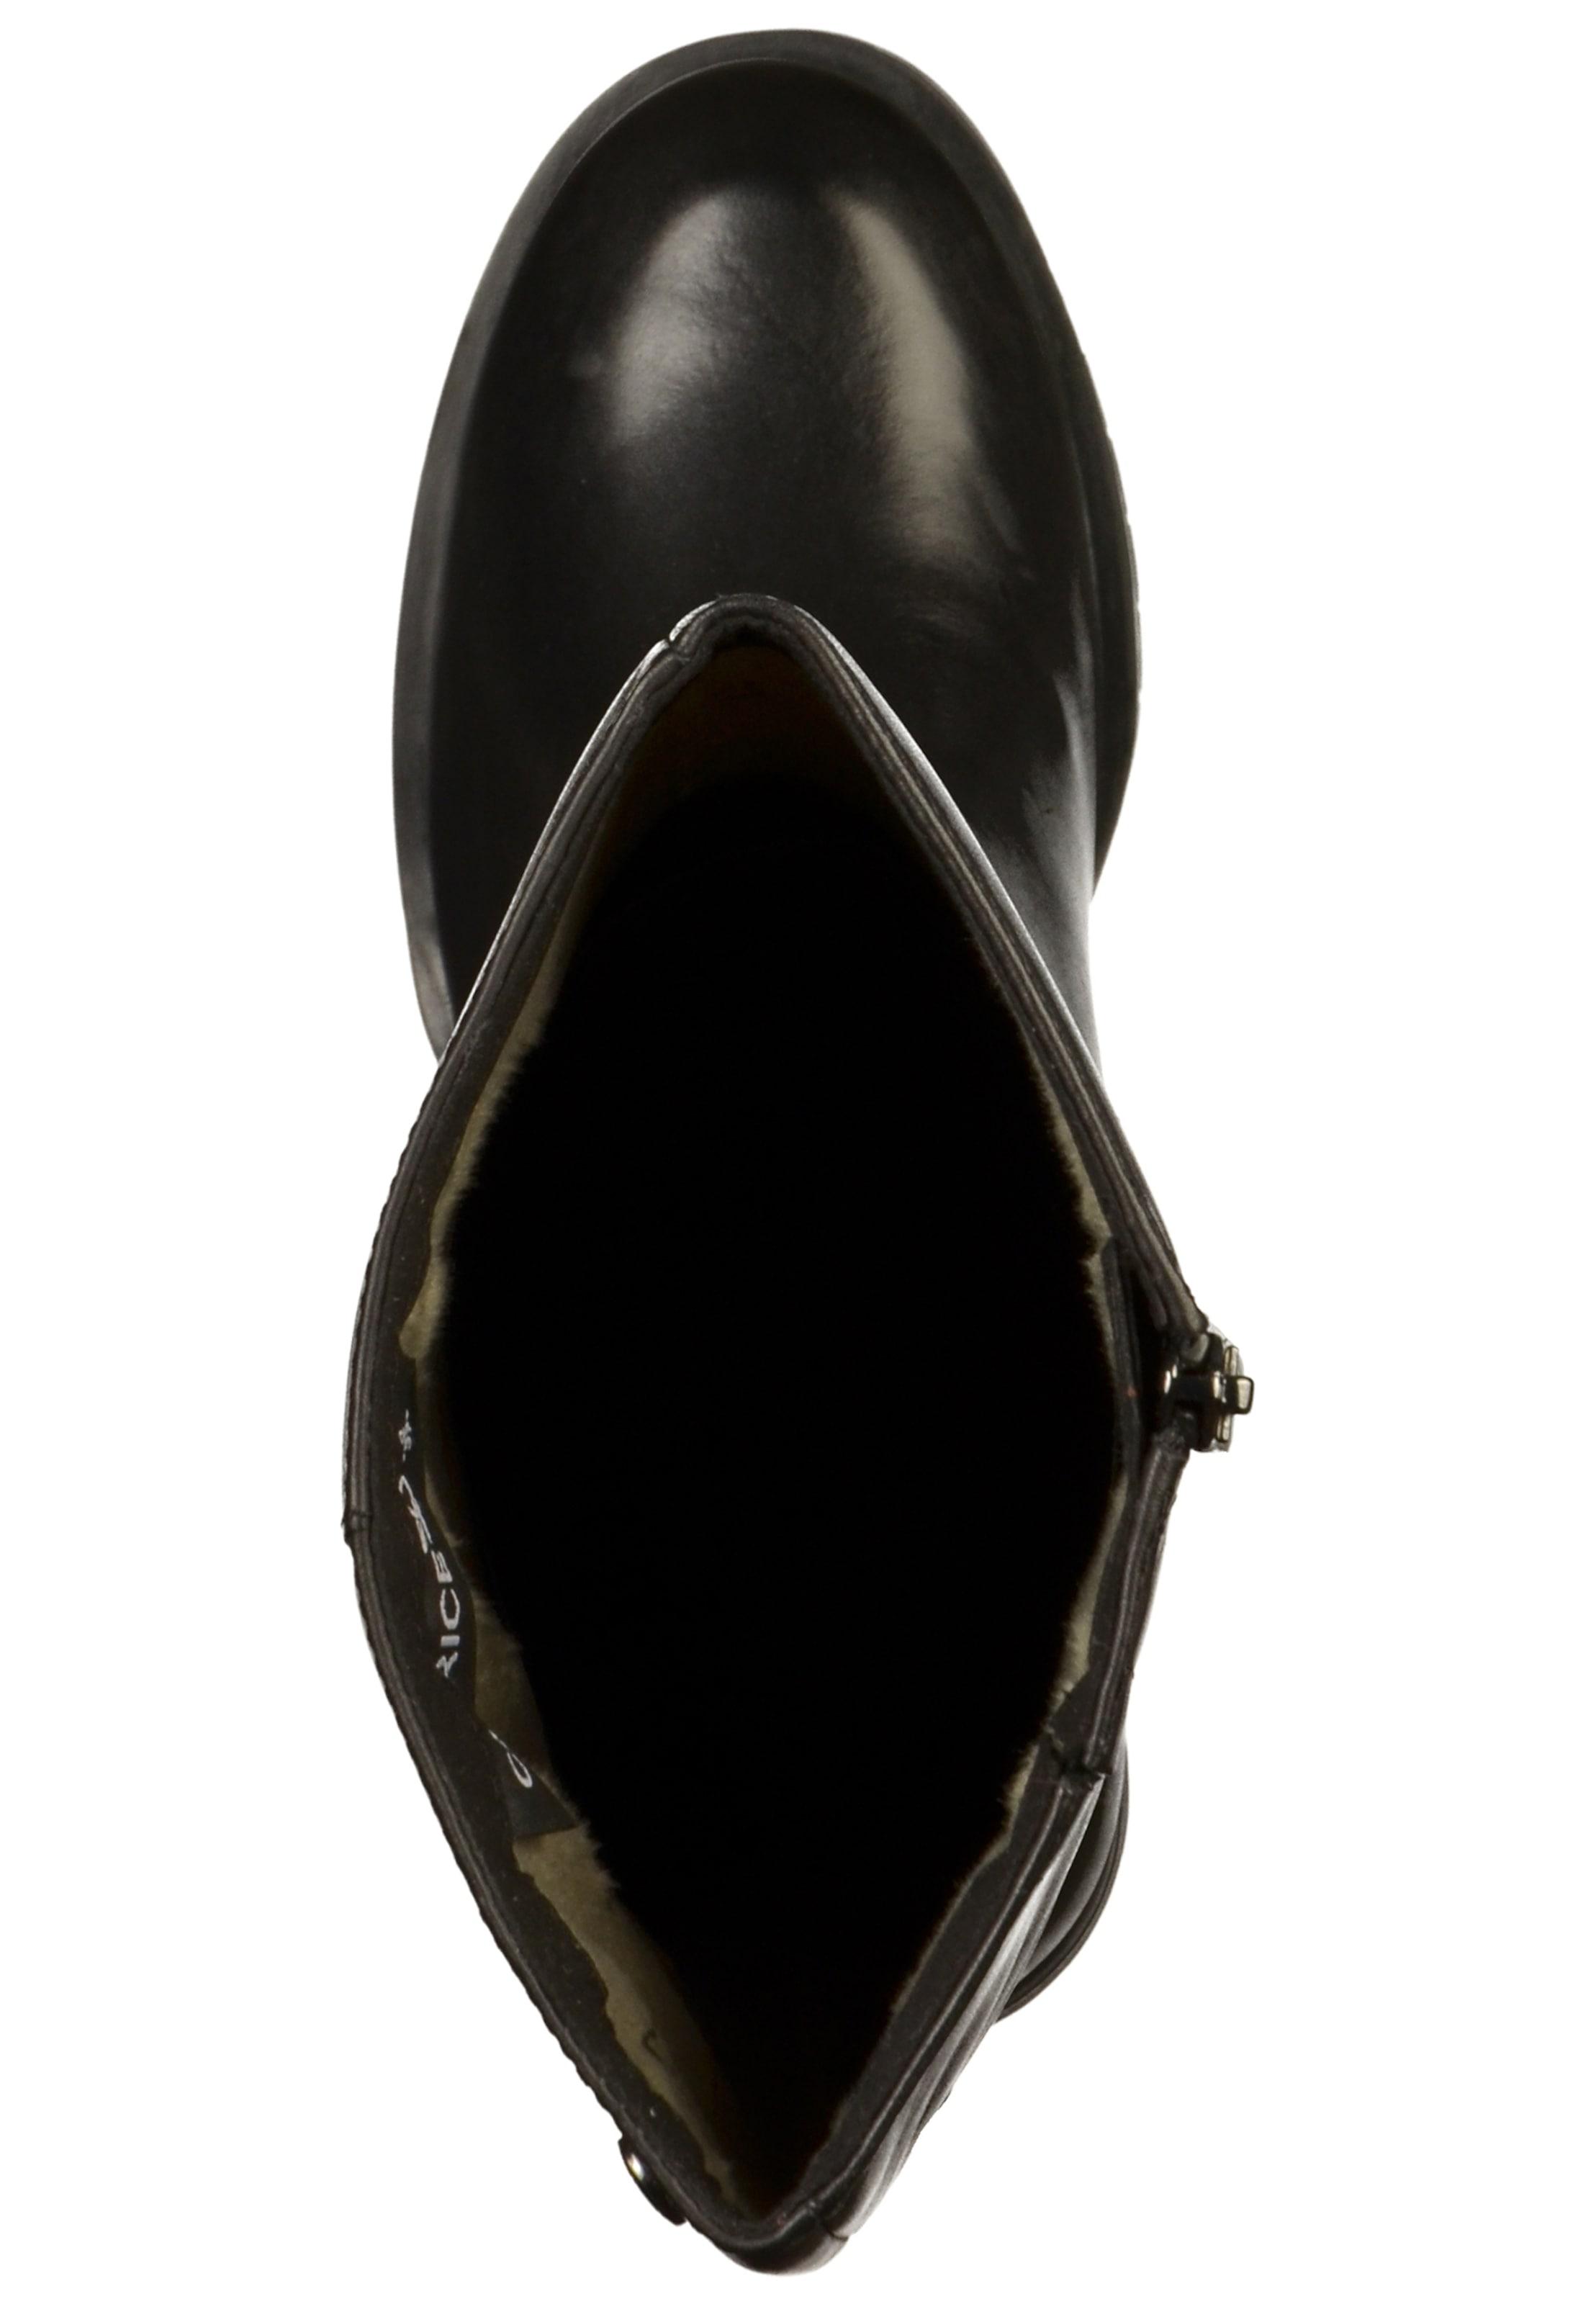 Stiefel Schwarz In Schwarz In Schwarz Caprice Stiefel Caprice Caprice Stiefel In In Stiefel Caprice TFK1clJ3